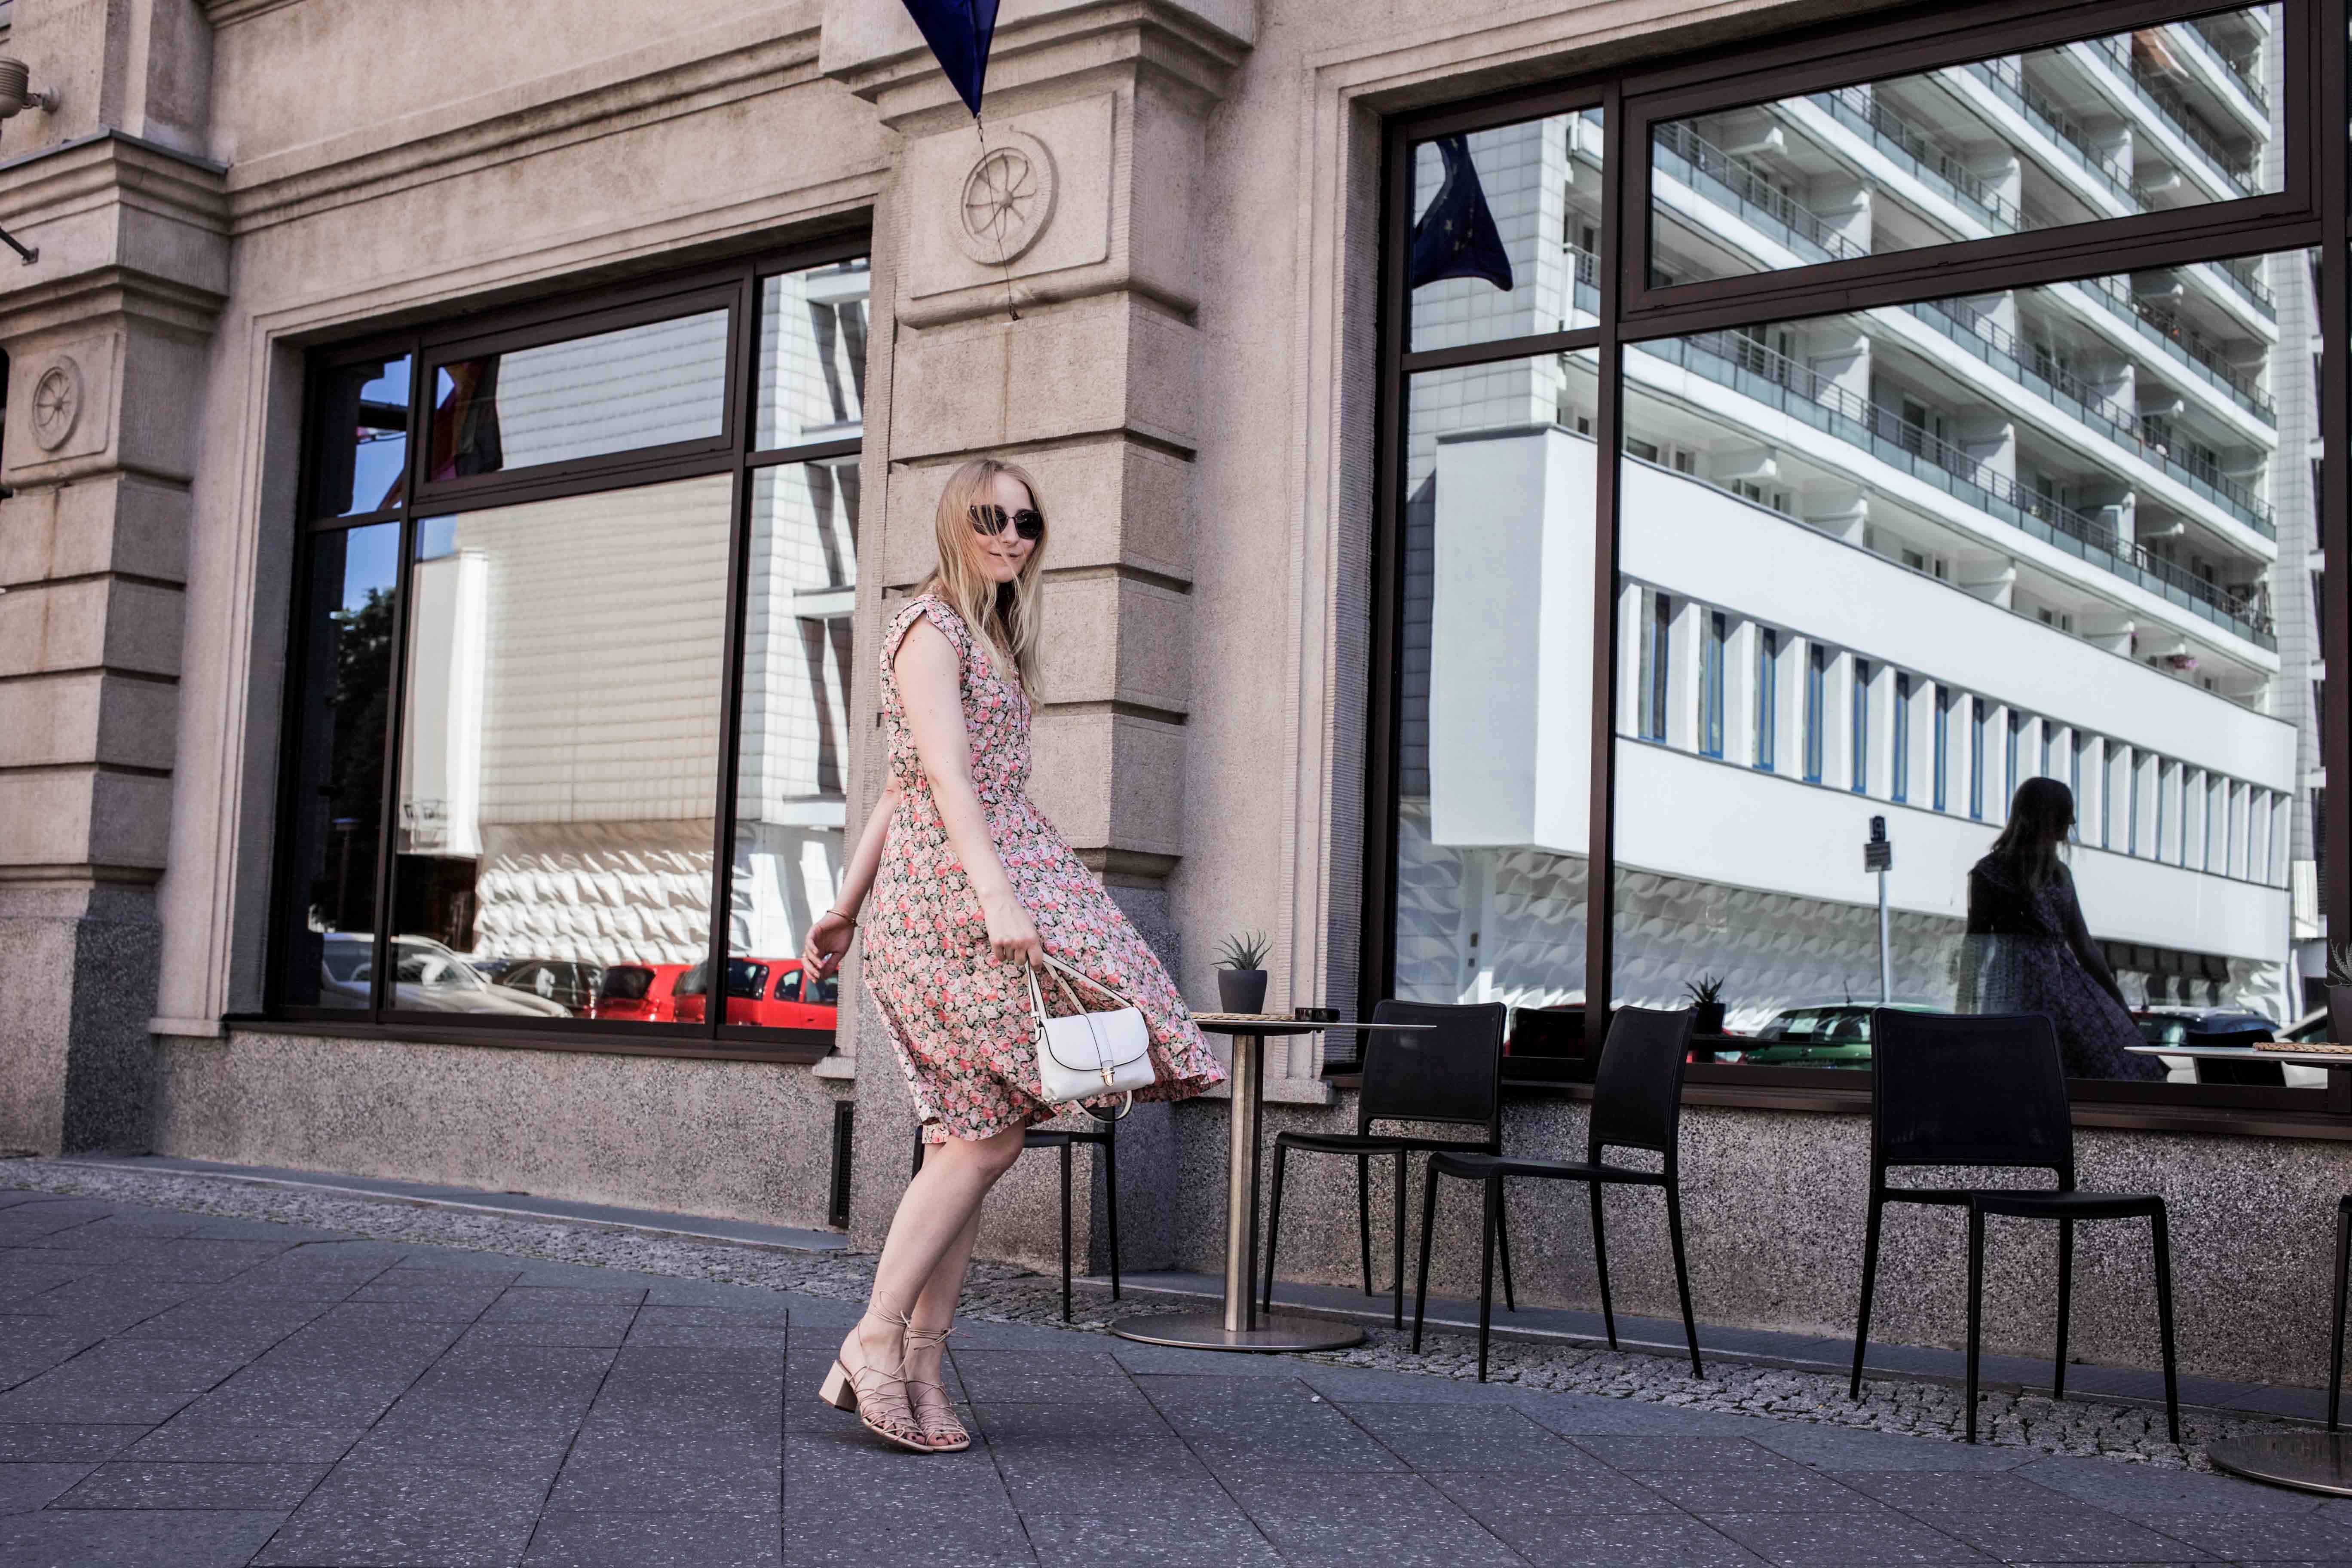 80er-jahre-blumenkleid-paris-vintage-lover-second-hand-outfit-look-fashionblogger-modeblog_7768